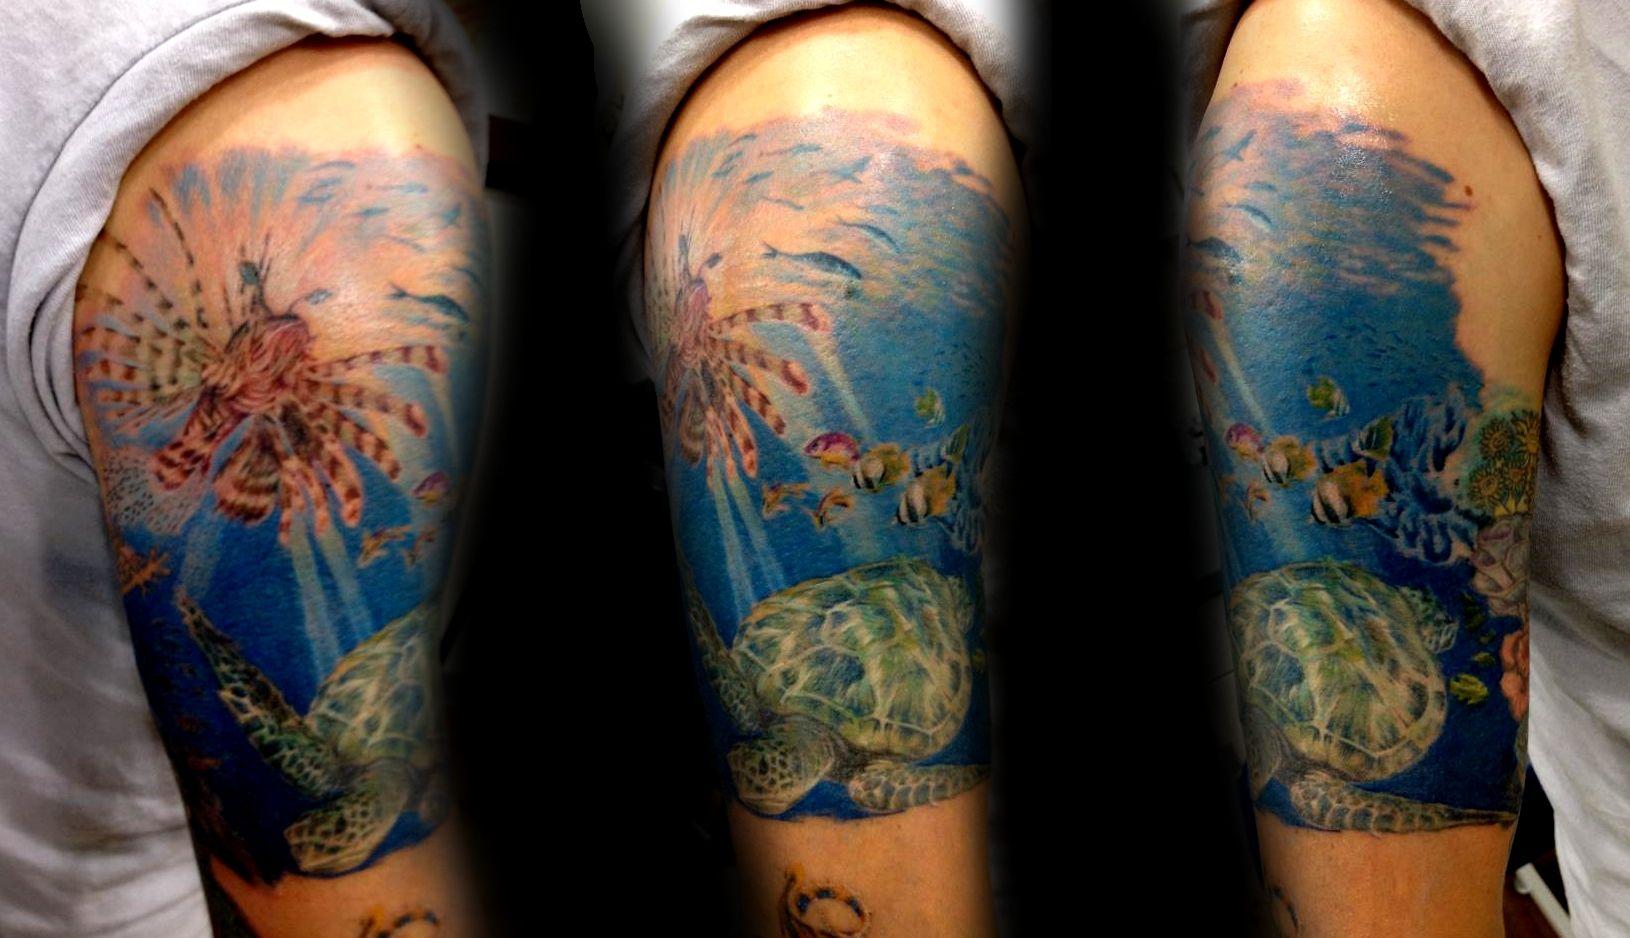 Underwater Ocean Tattoos 612802 68fc8a74ef280c7e52308b0a3a0bfd19